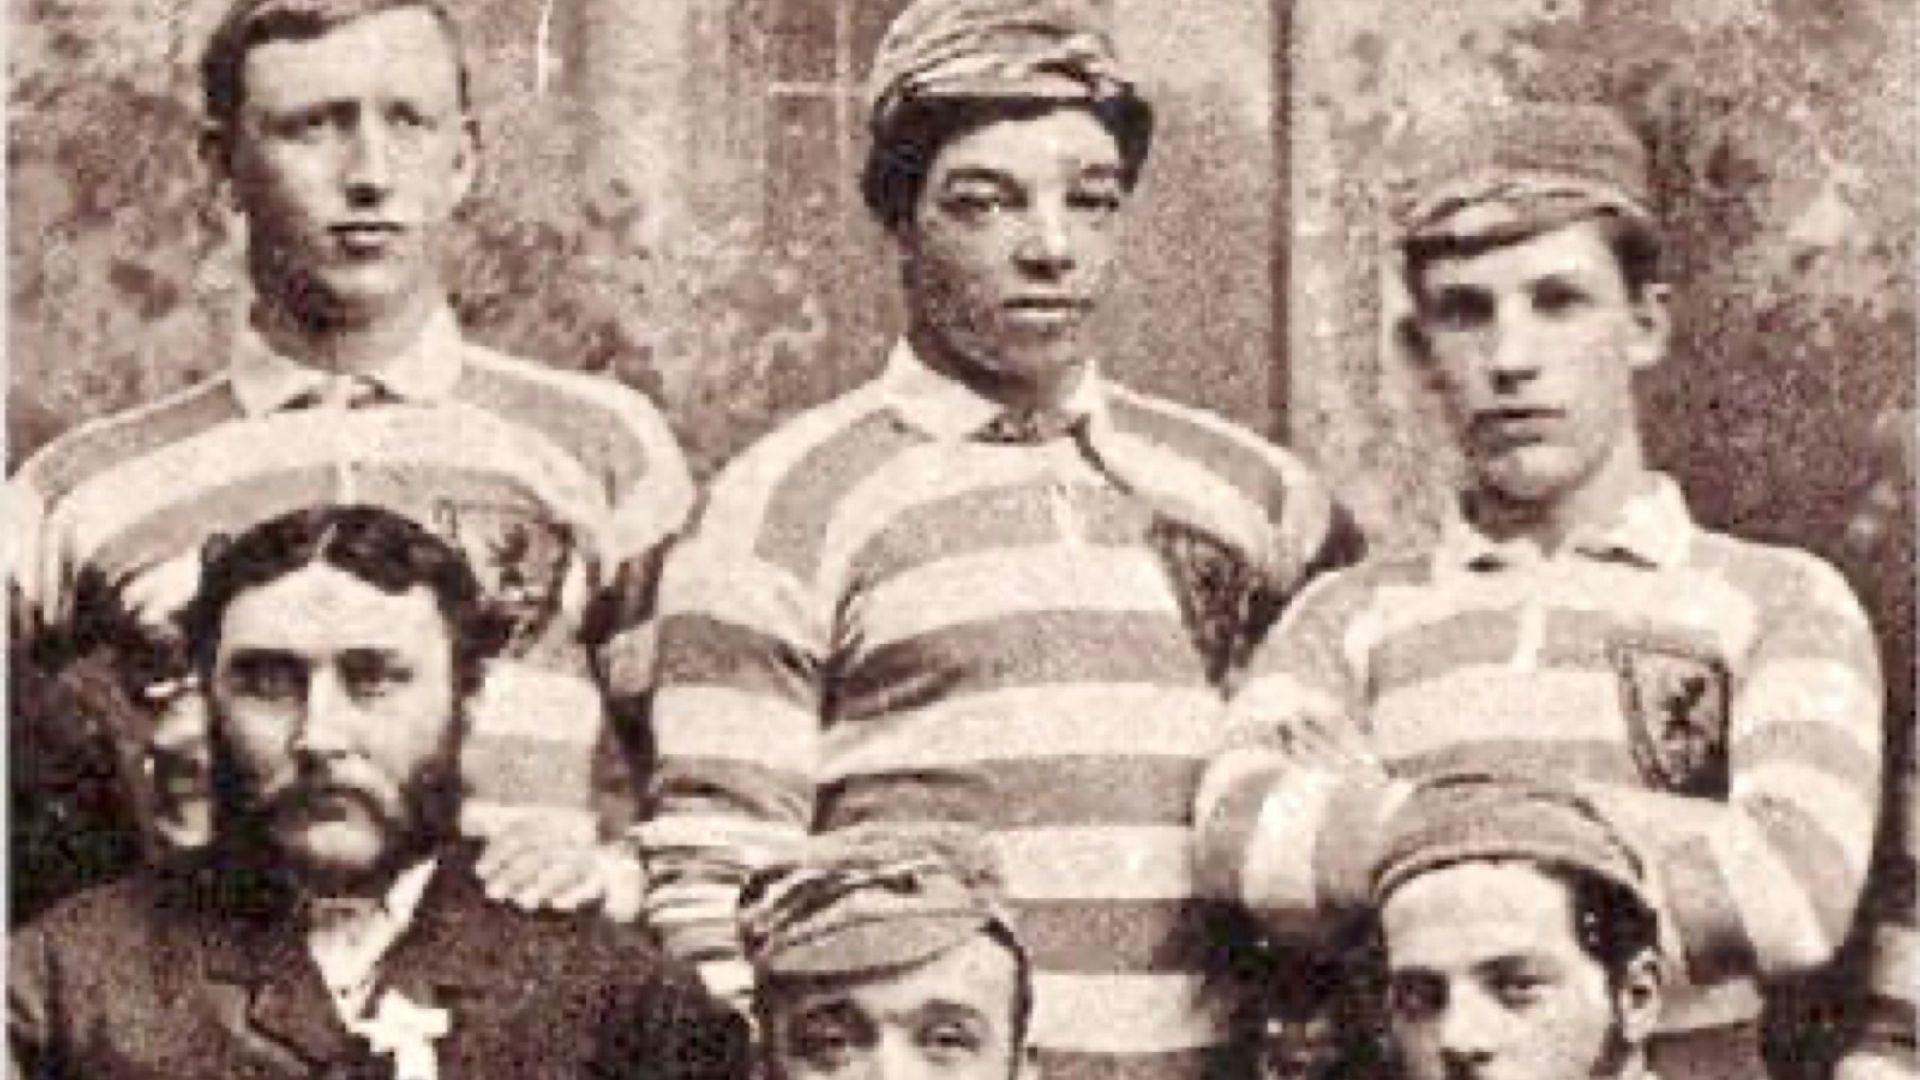 How Scotland's 'Pele' taught England a lesson, twice